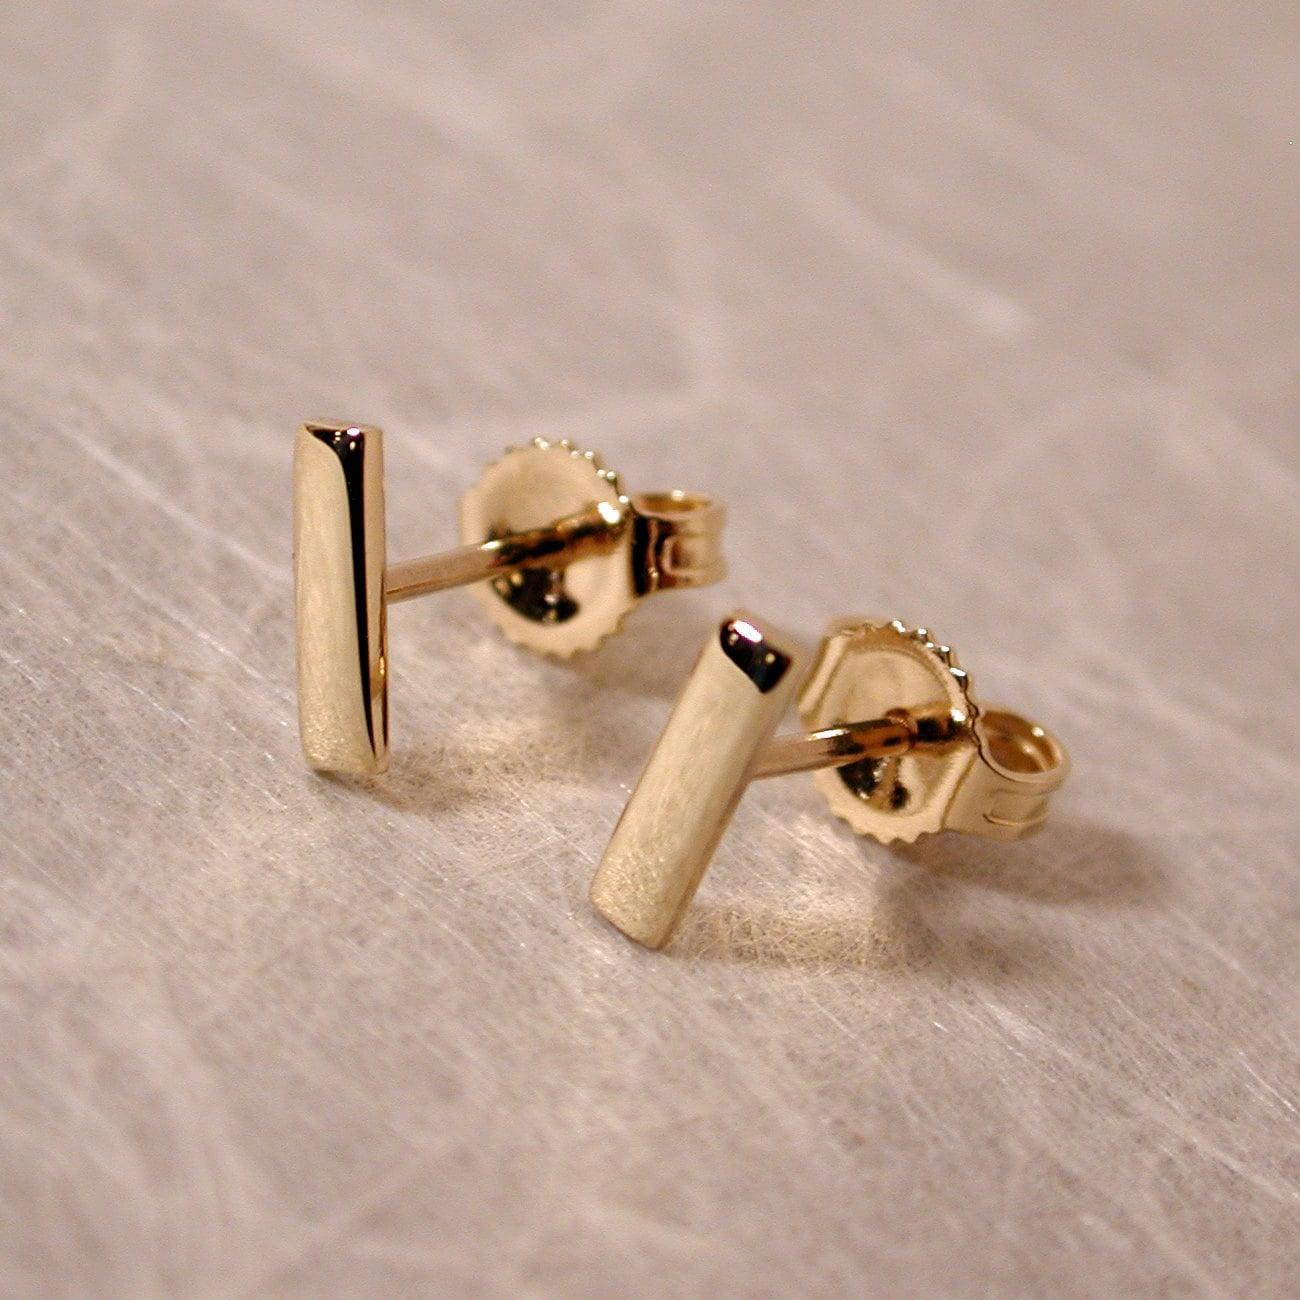 7mm x 2mm 14k gold bar stud earrings 14k yellow gold by